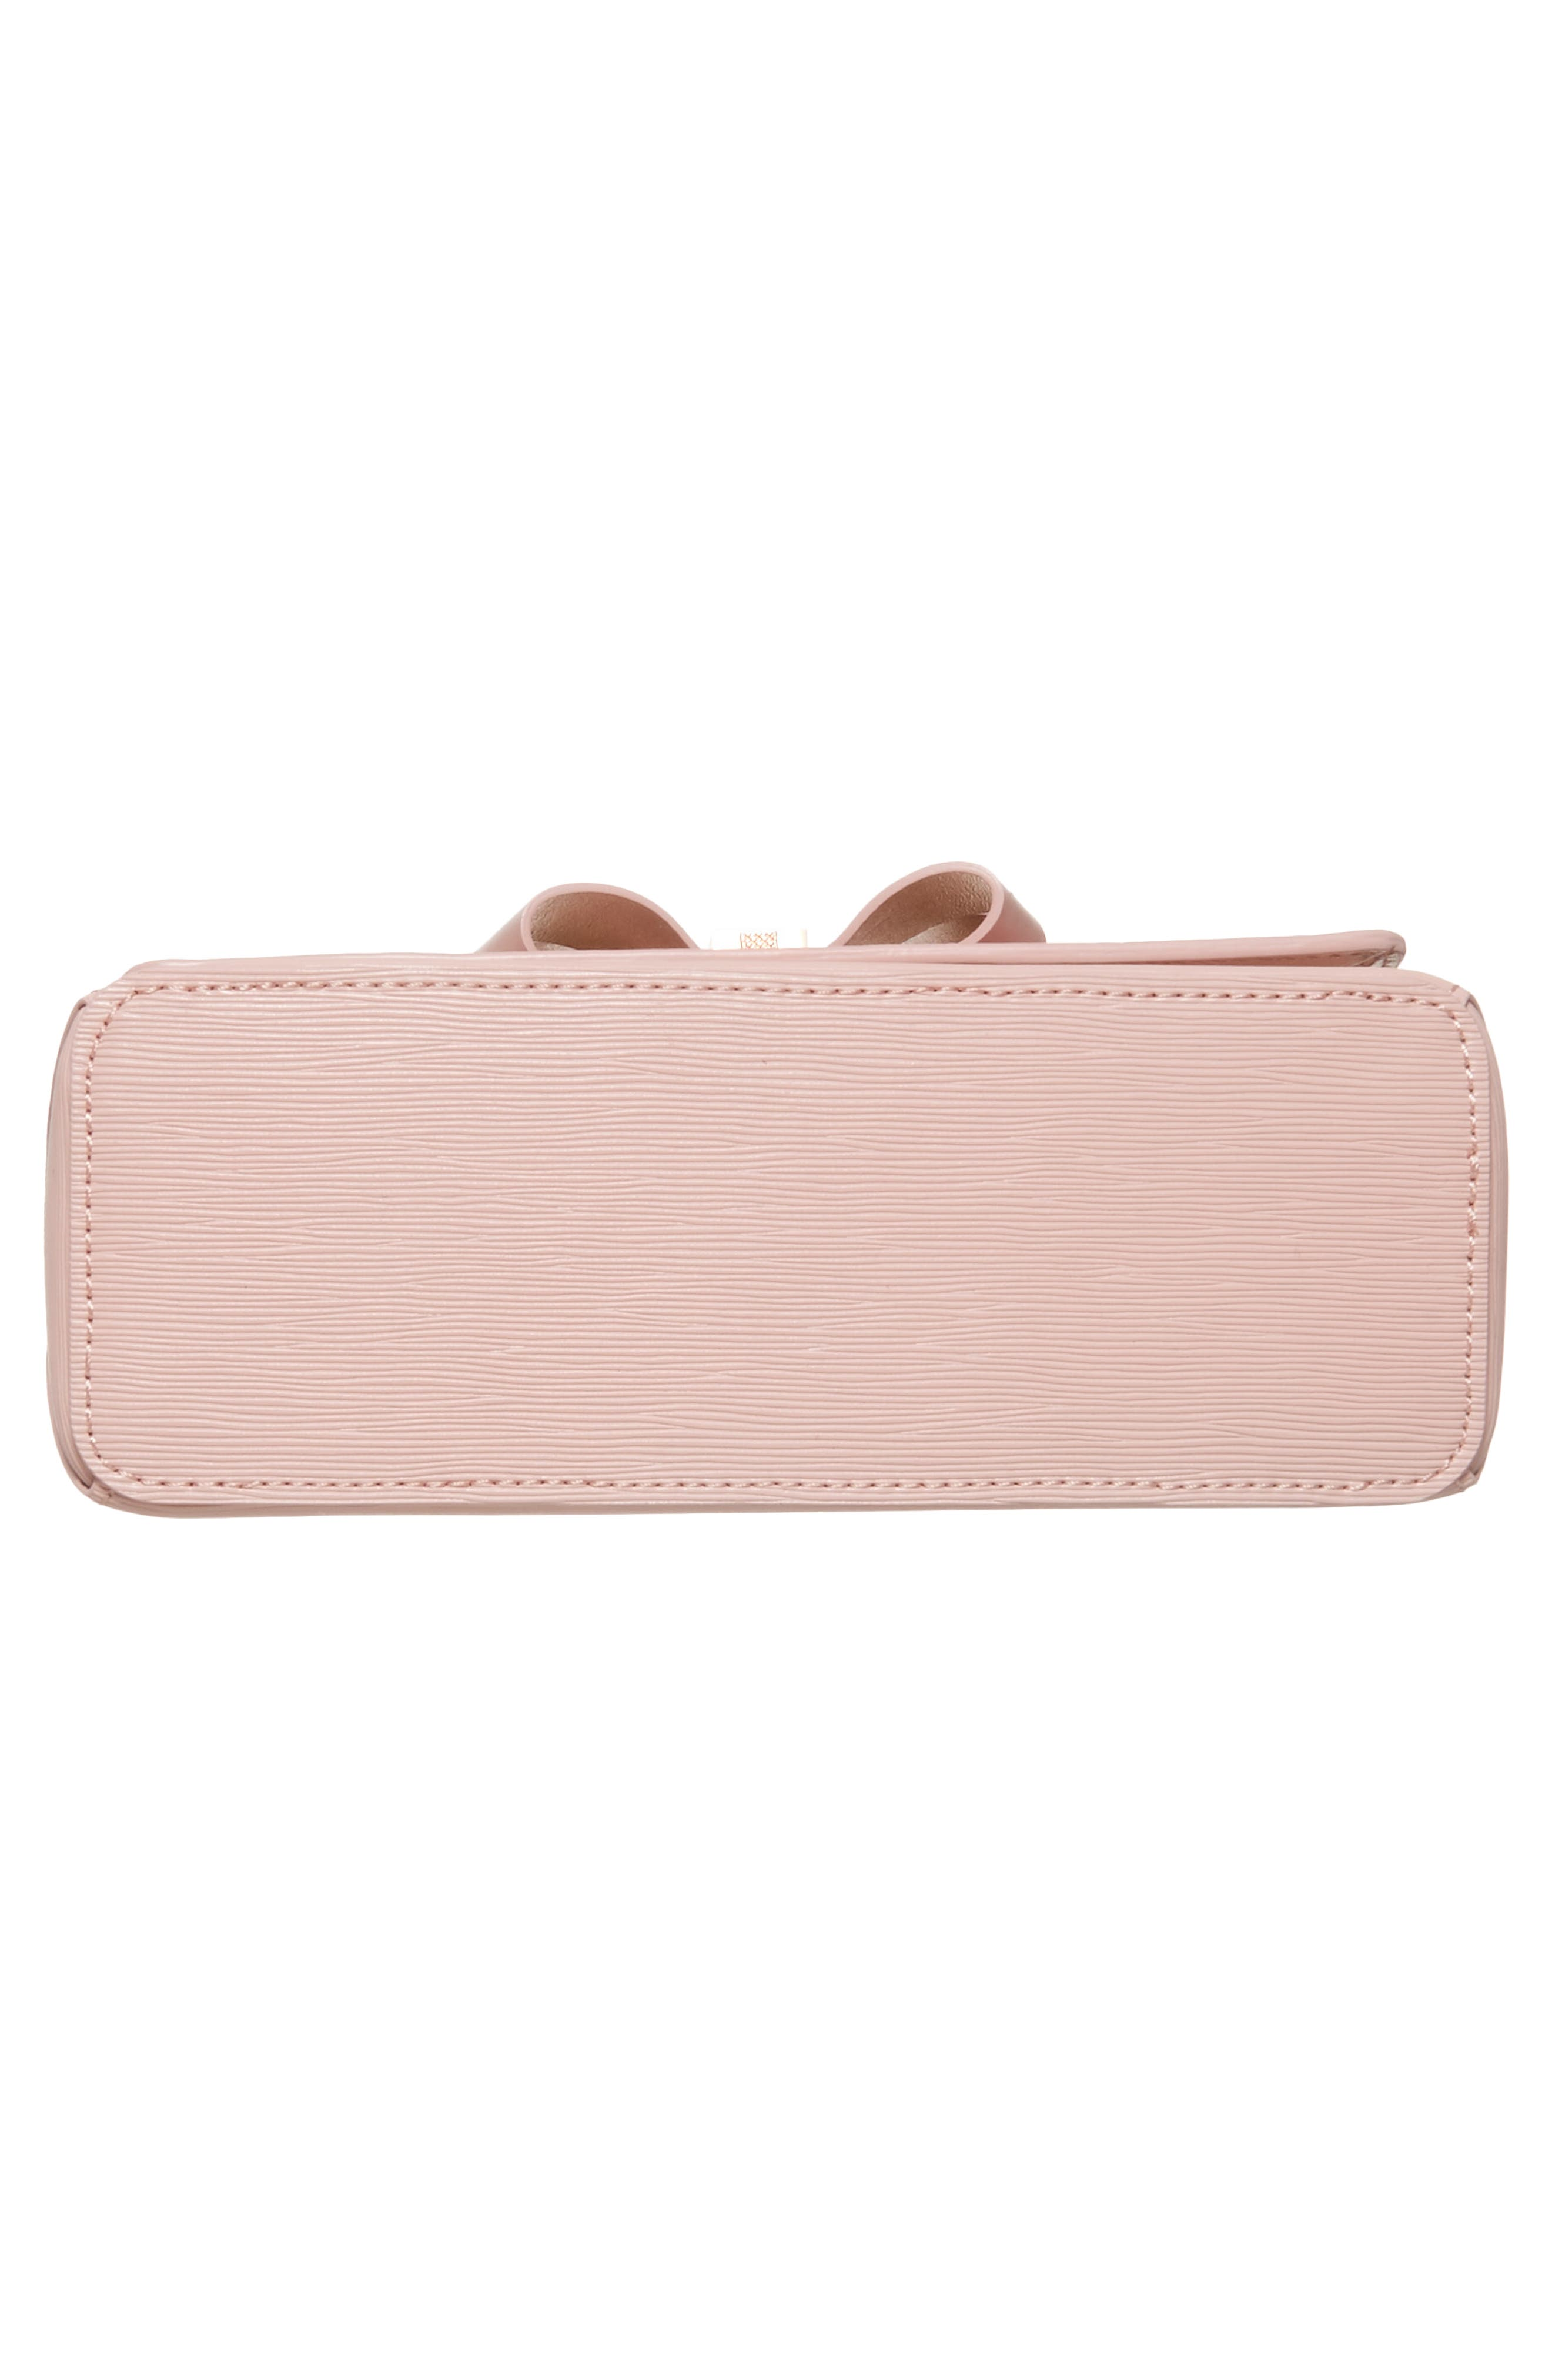 Bowii Bow Mini Bark Leather Crossbody Bag,                             Alternate thumbnail 6, color,                             Light Pink